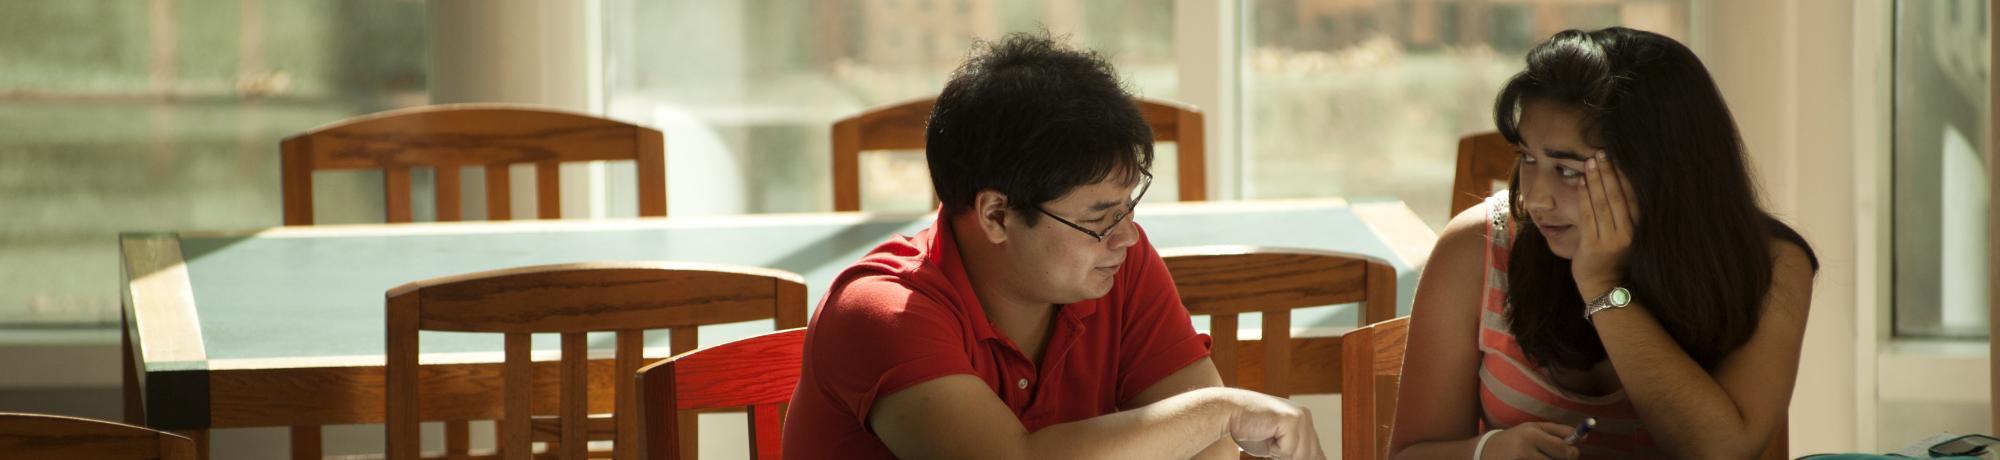 uc davis graduate school application deadline